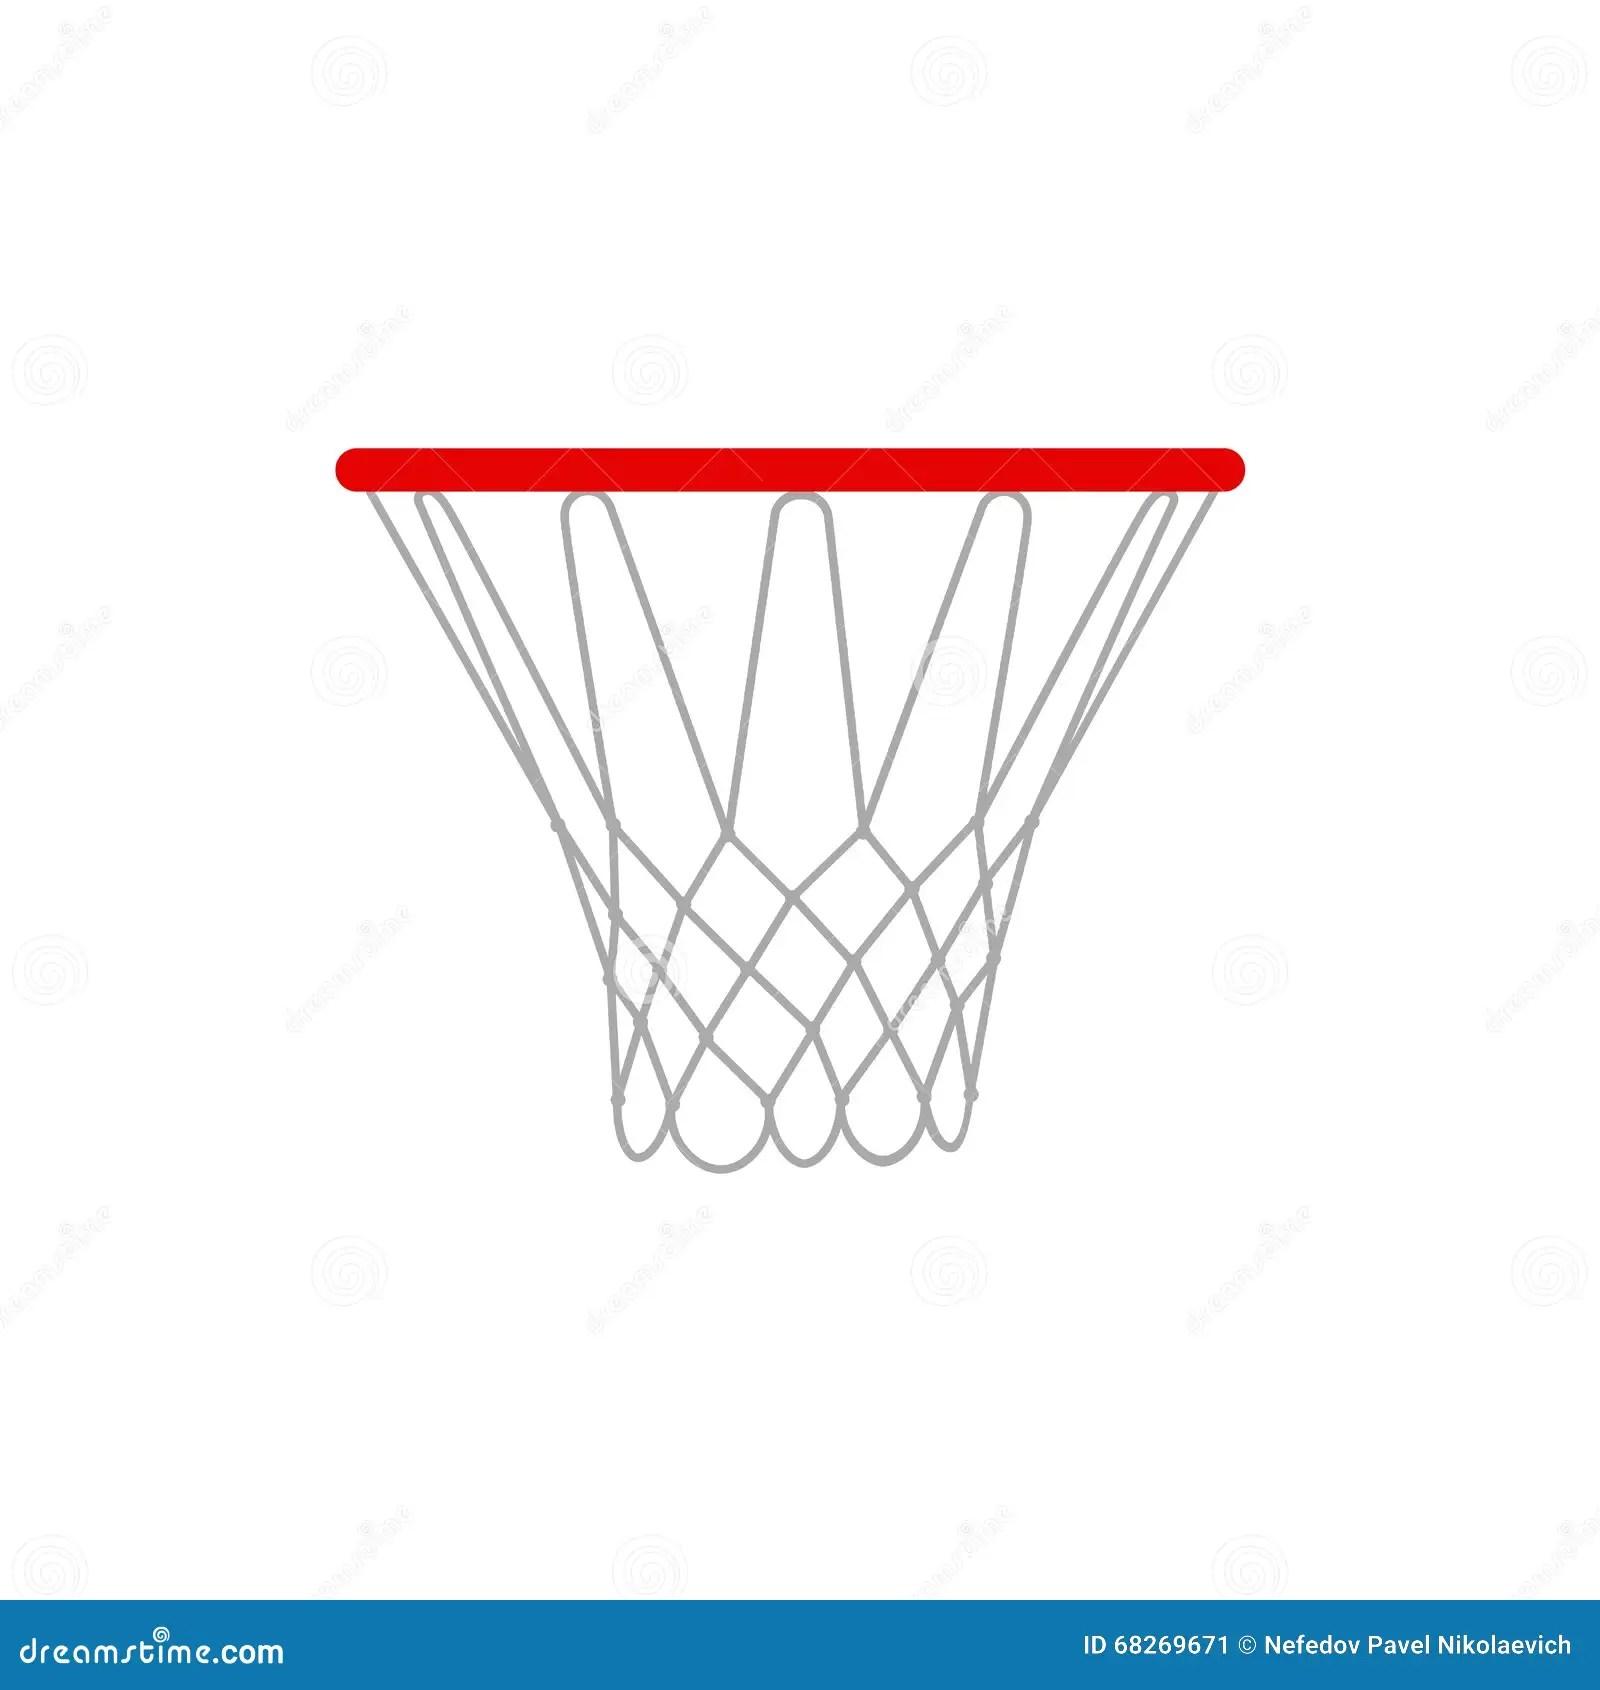 A Illustration Of A Basketball Rims Basketball Hoop